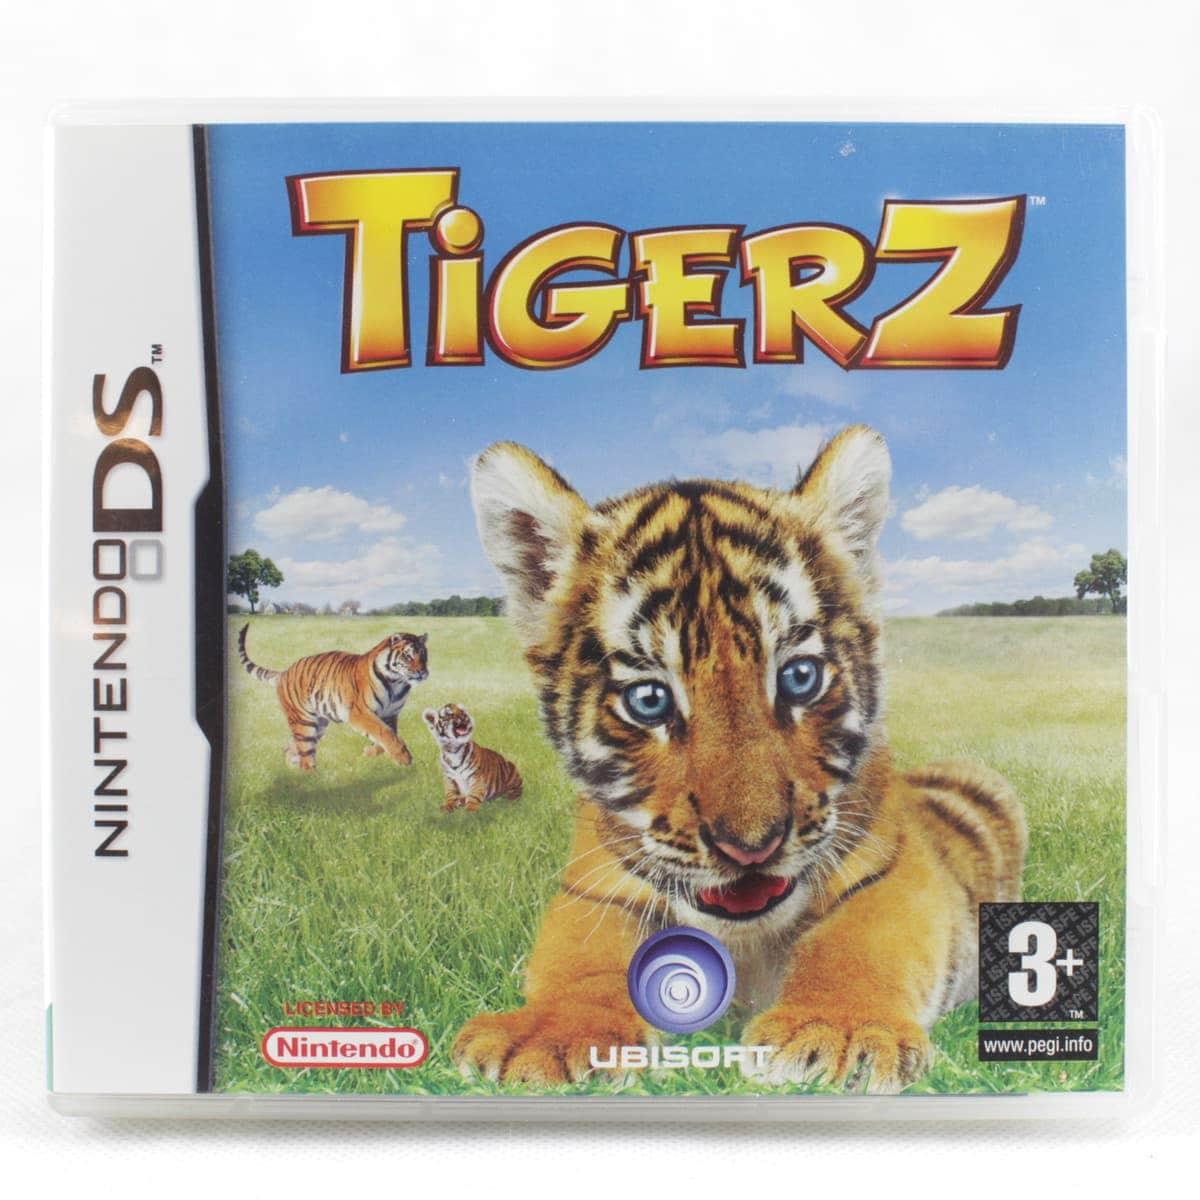 Tigerz (Nintendo DS)